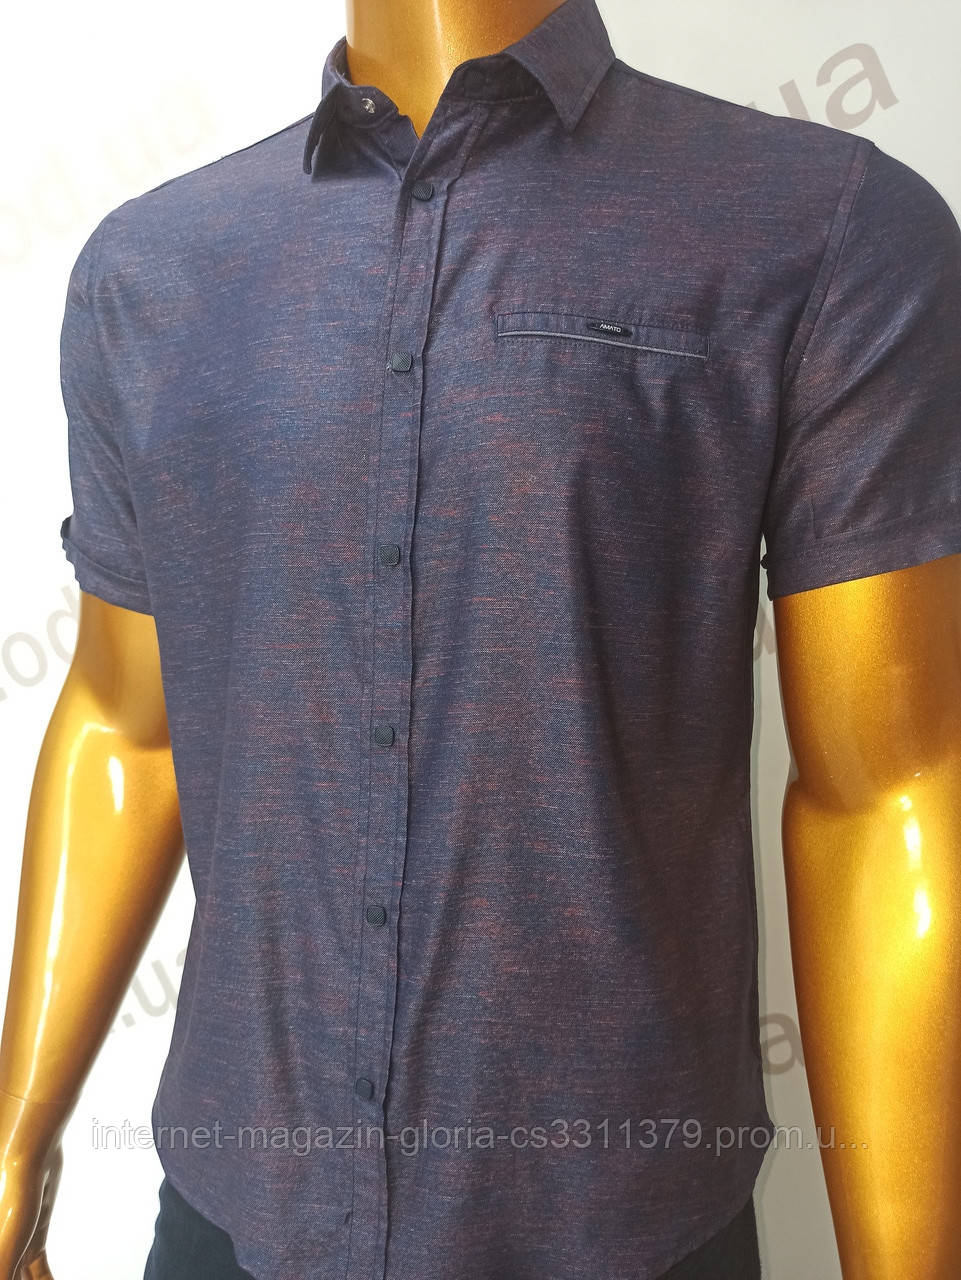 Мужская рубашка Amato. AG.19638-2(f). Размеры:M,L,XL(2), 2XL.